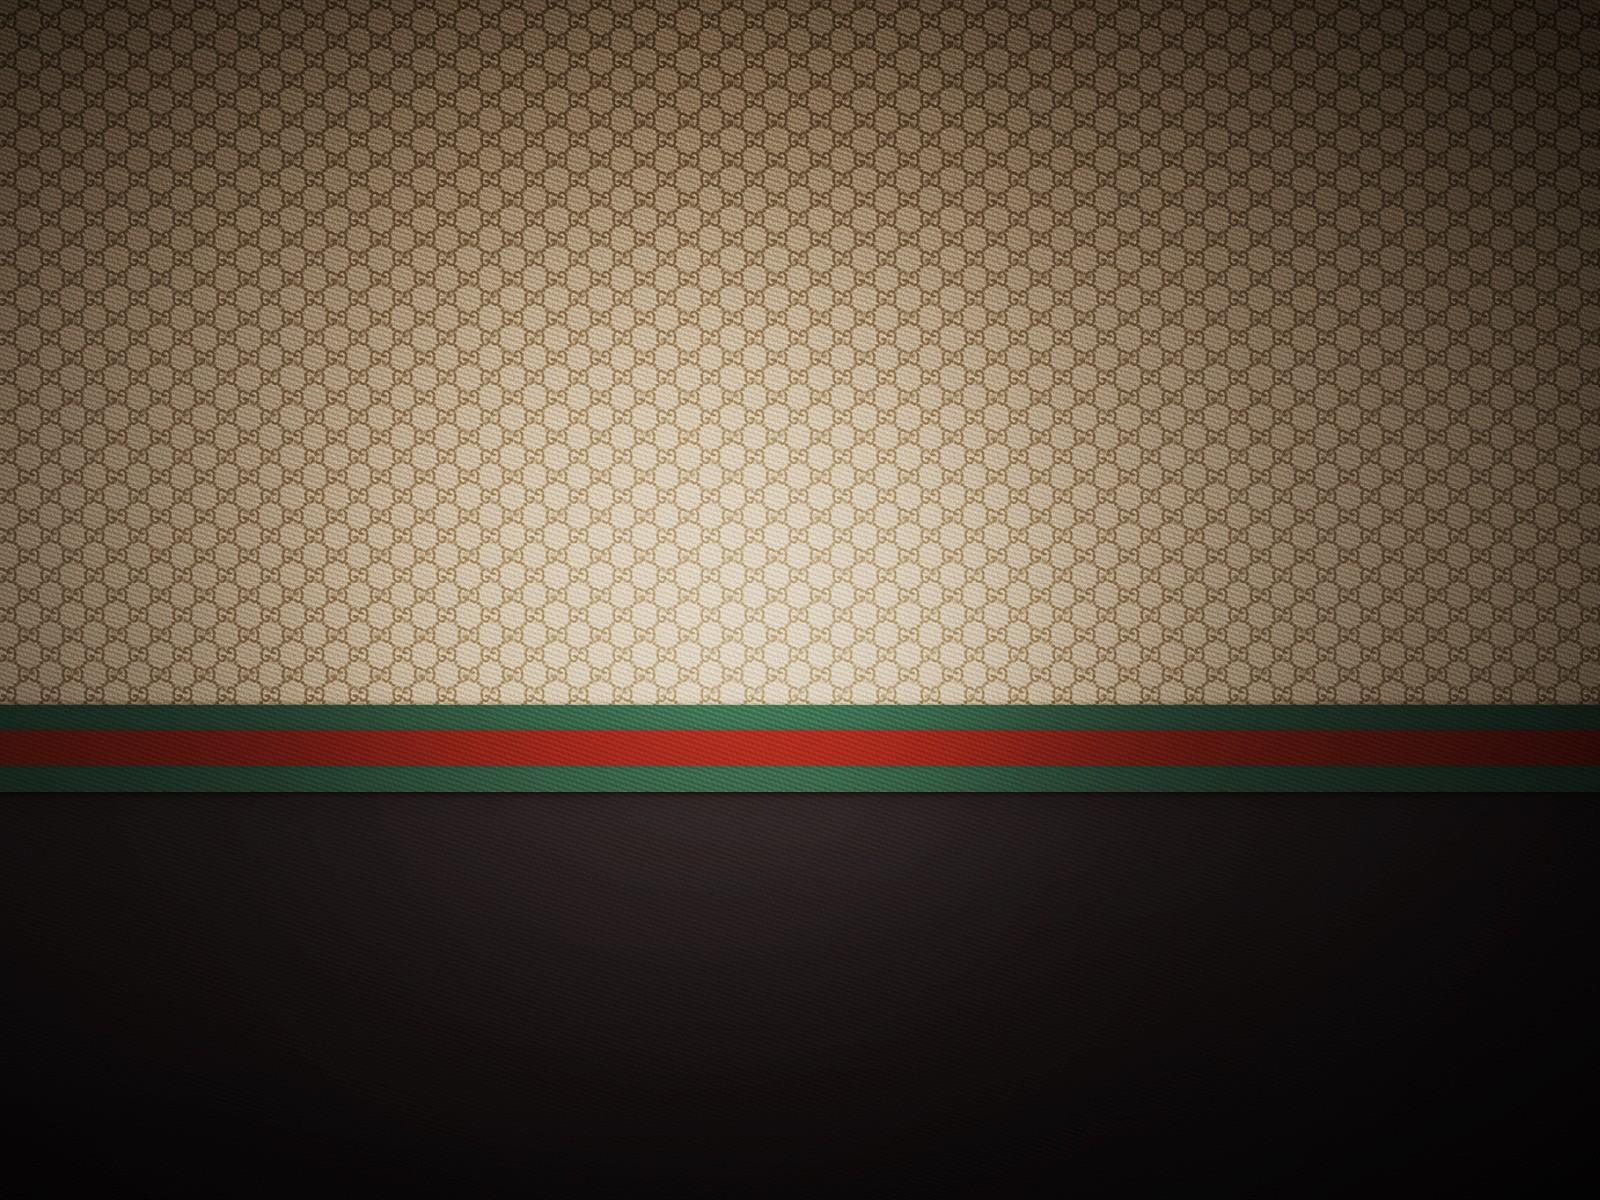 gucci wallpaper for home